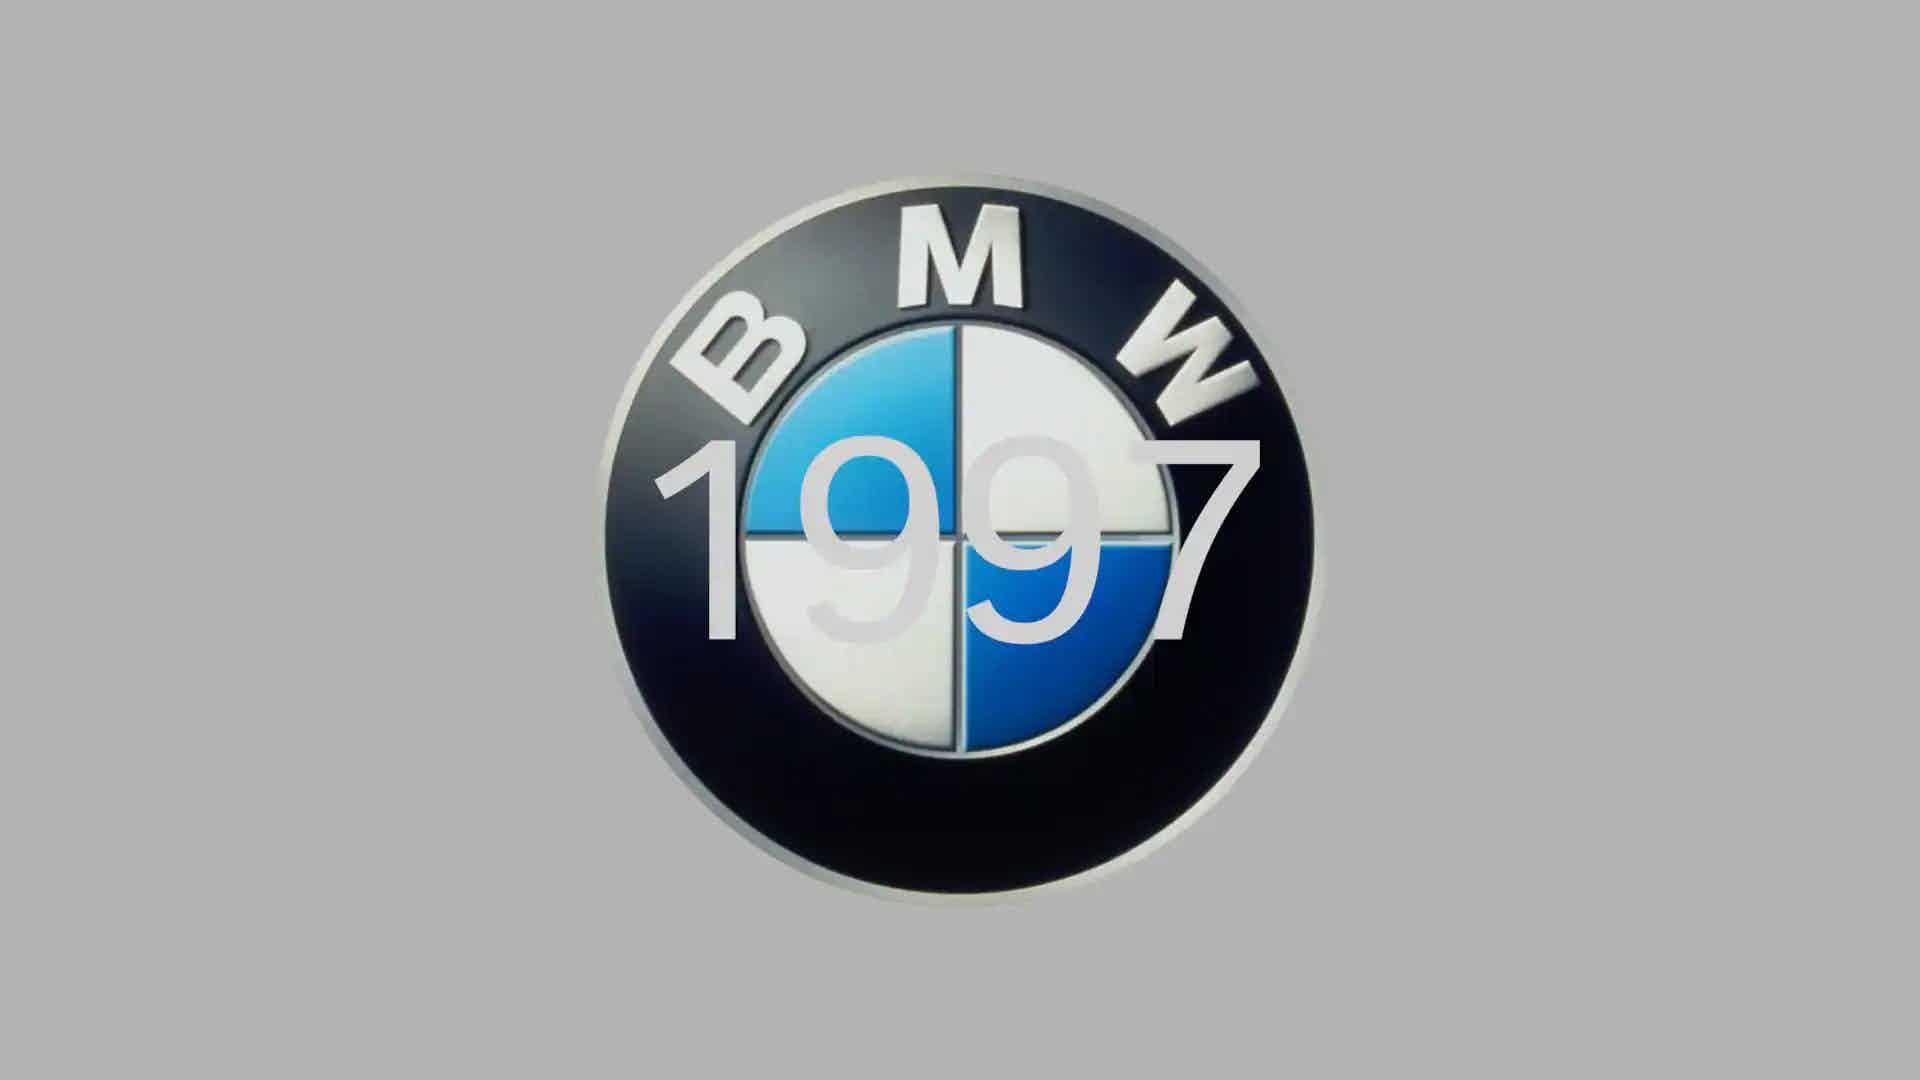 BMW 1997 logo design